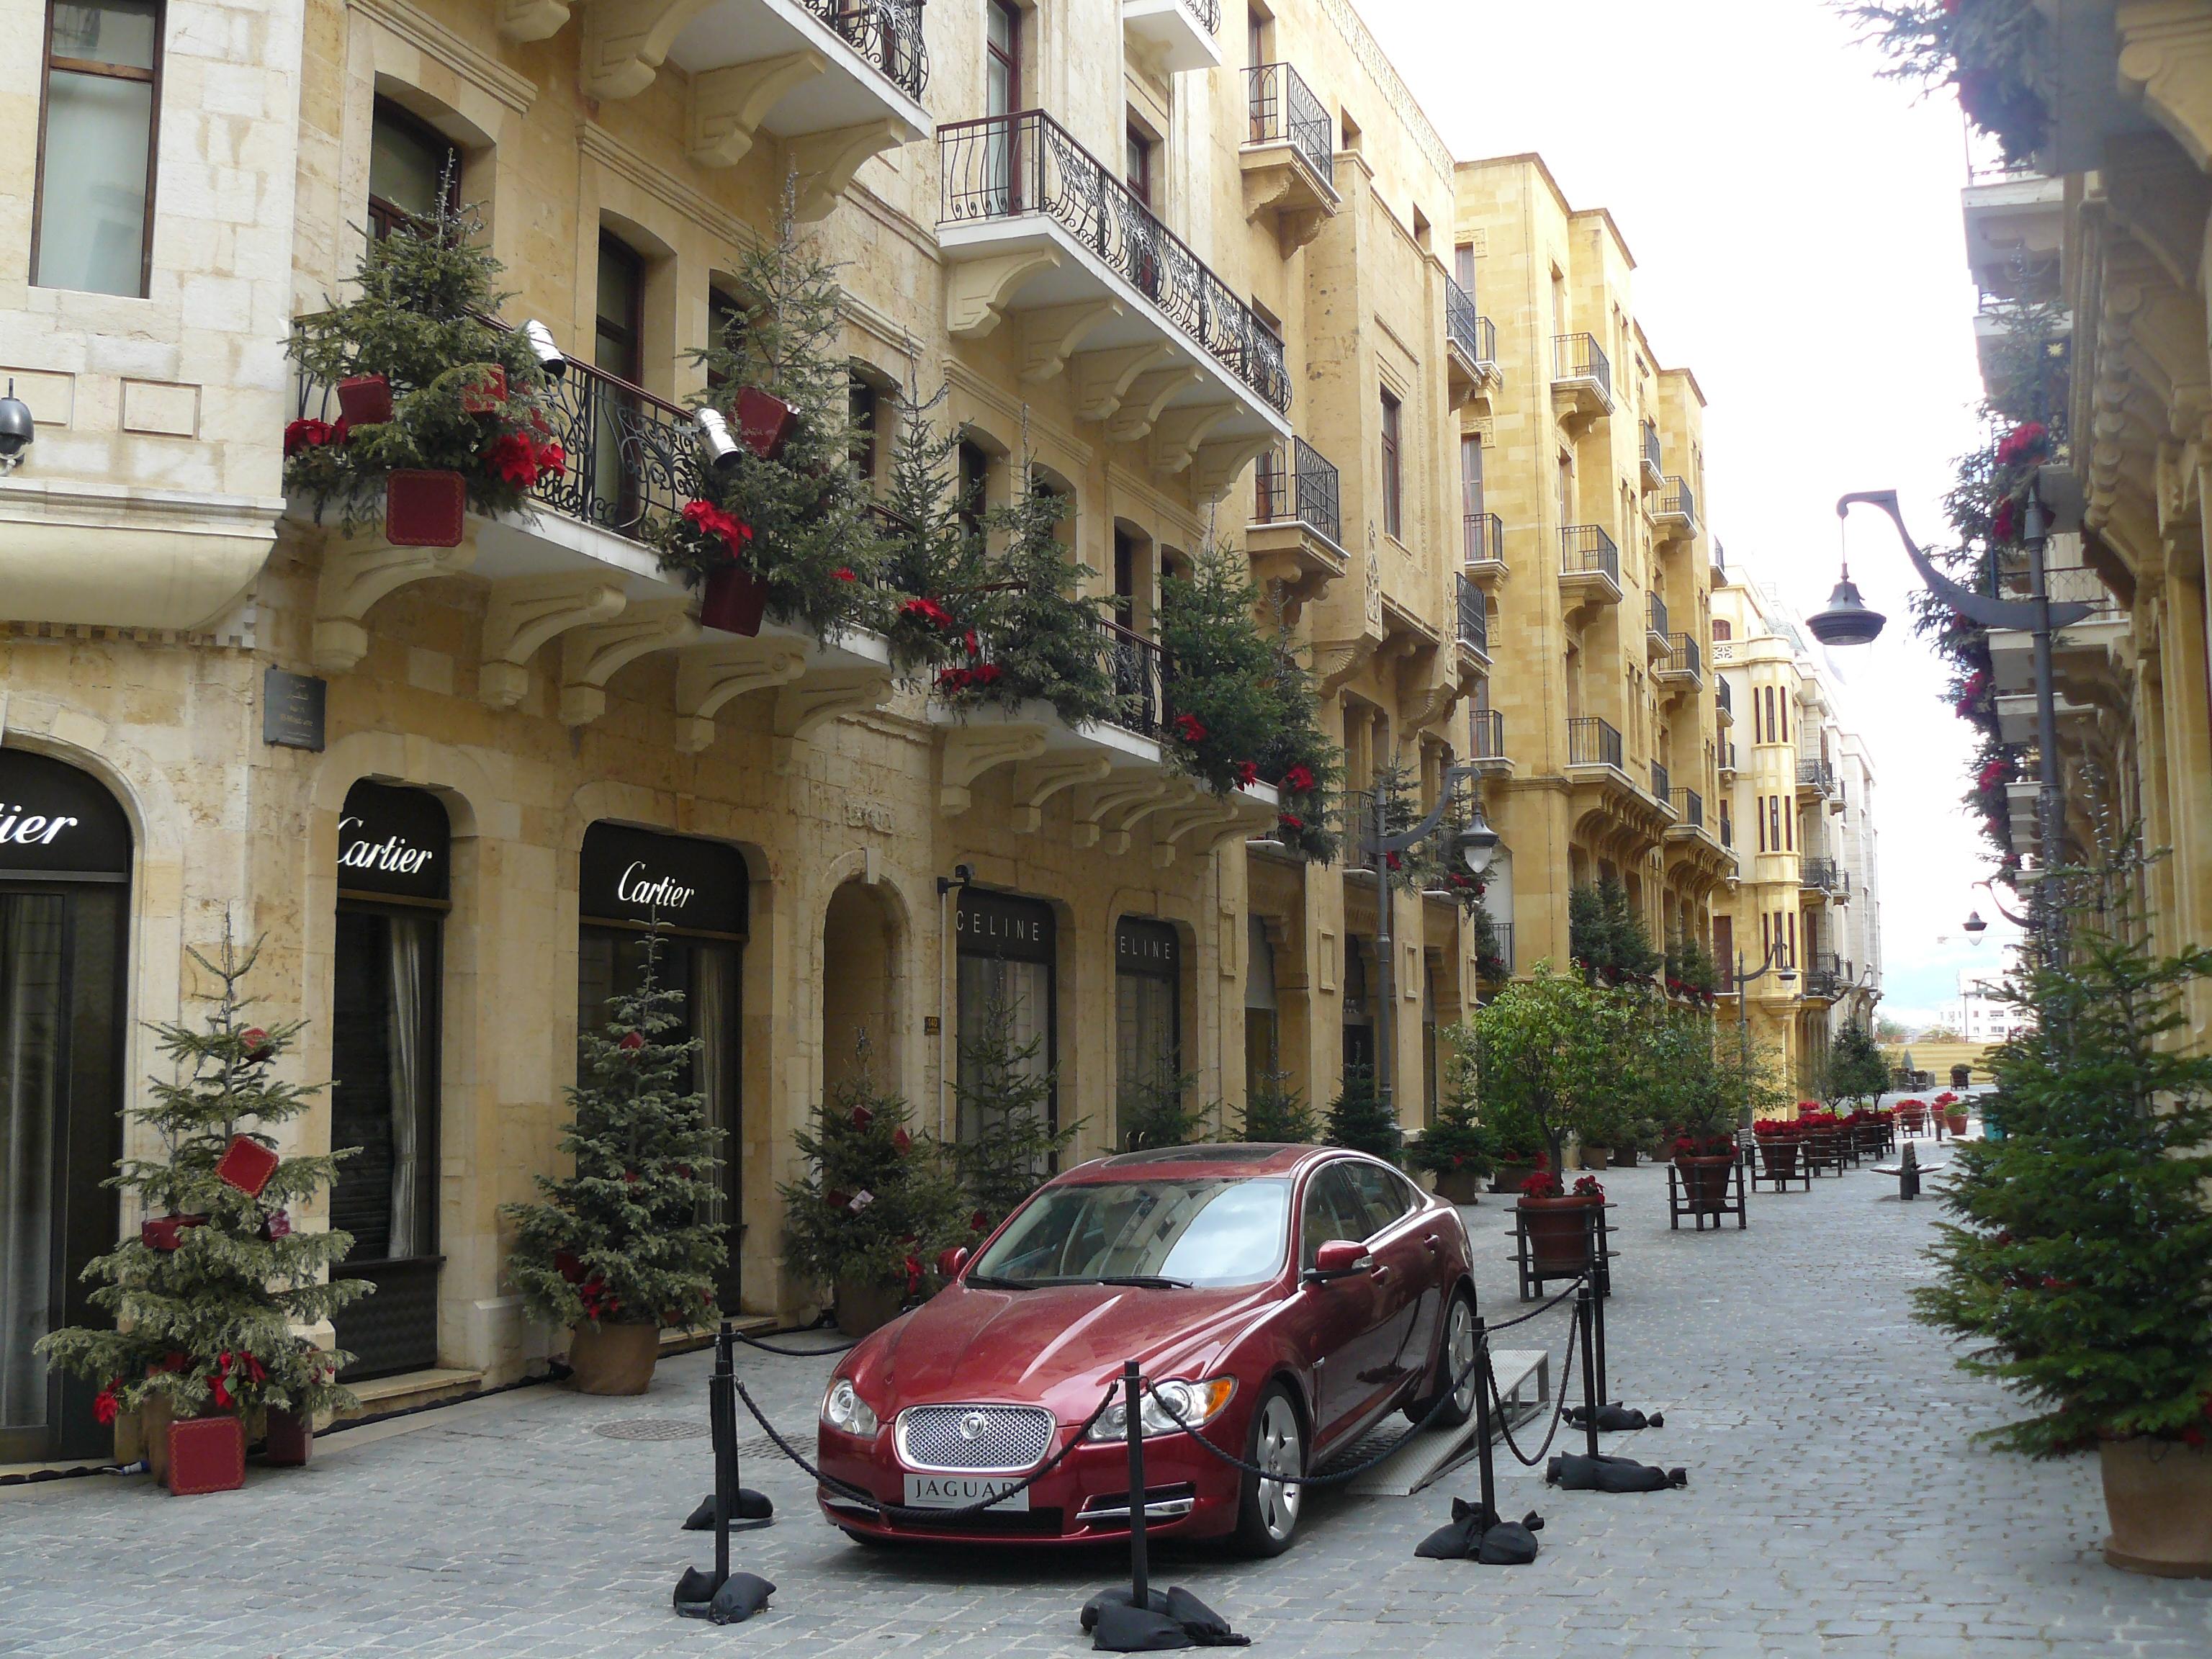 Beirut Images